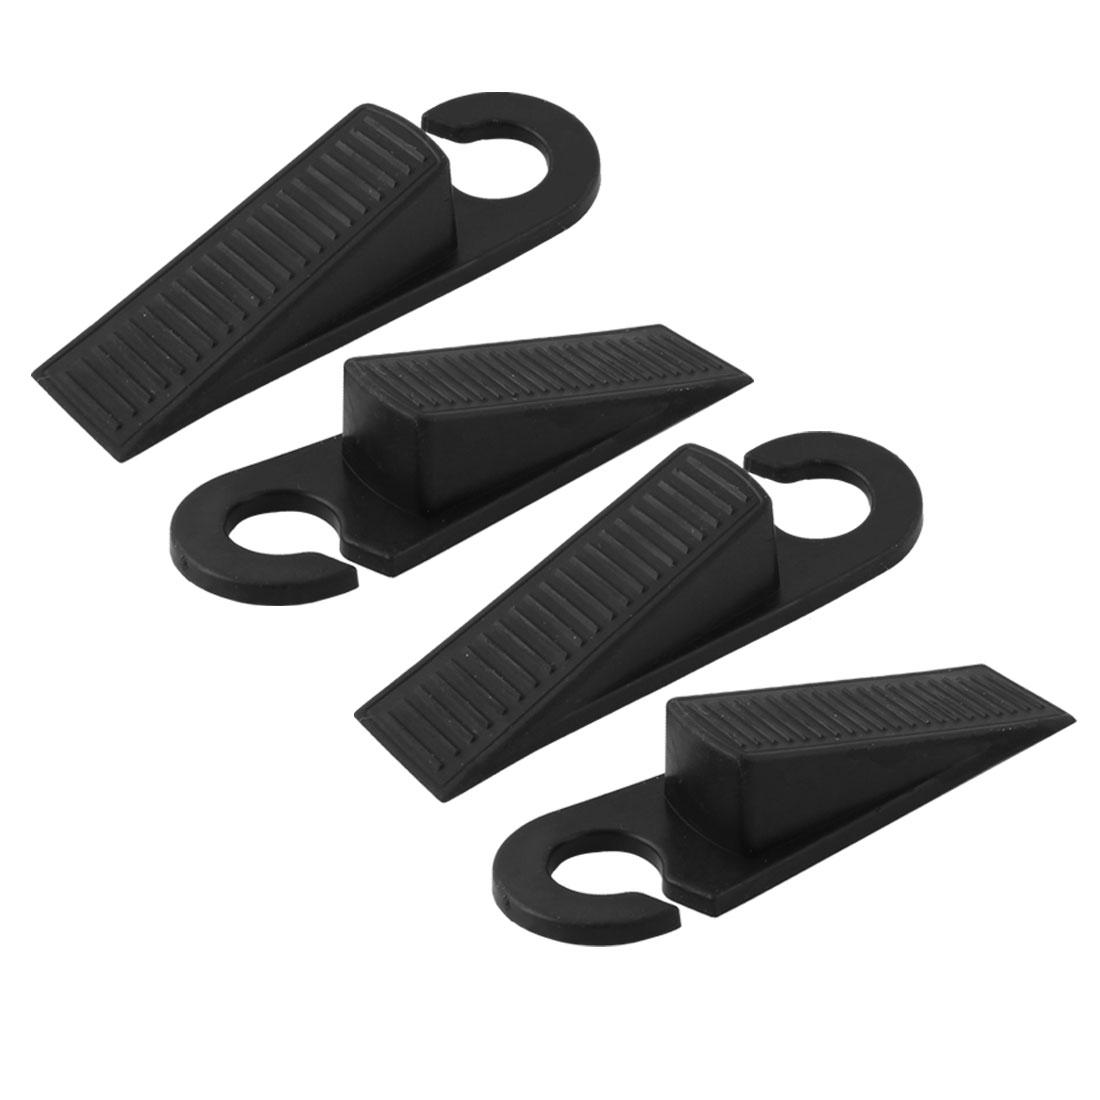 Unique Bargains 4 Pcs Rubber Anti-slip  Wedge Door Stop Black